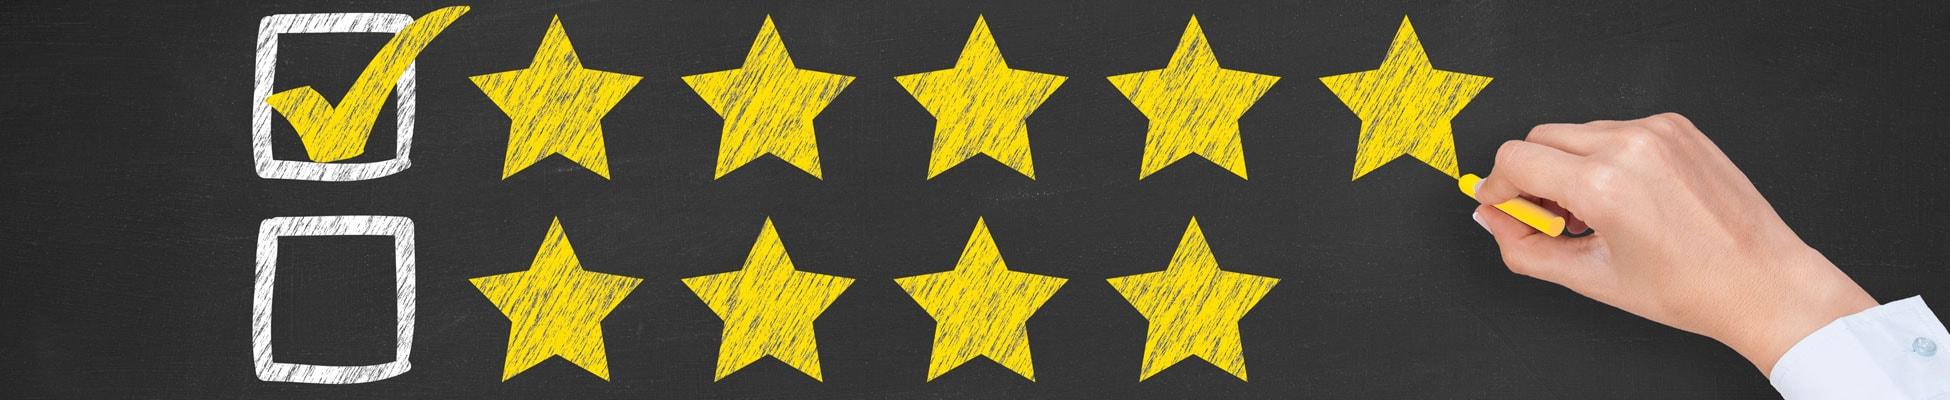 Rating Five Golden Stars on Chalkboard